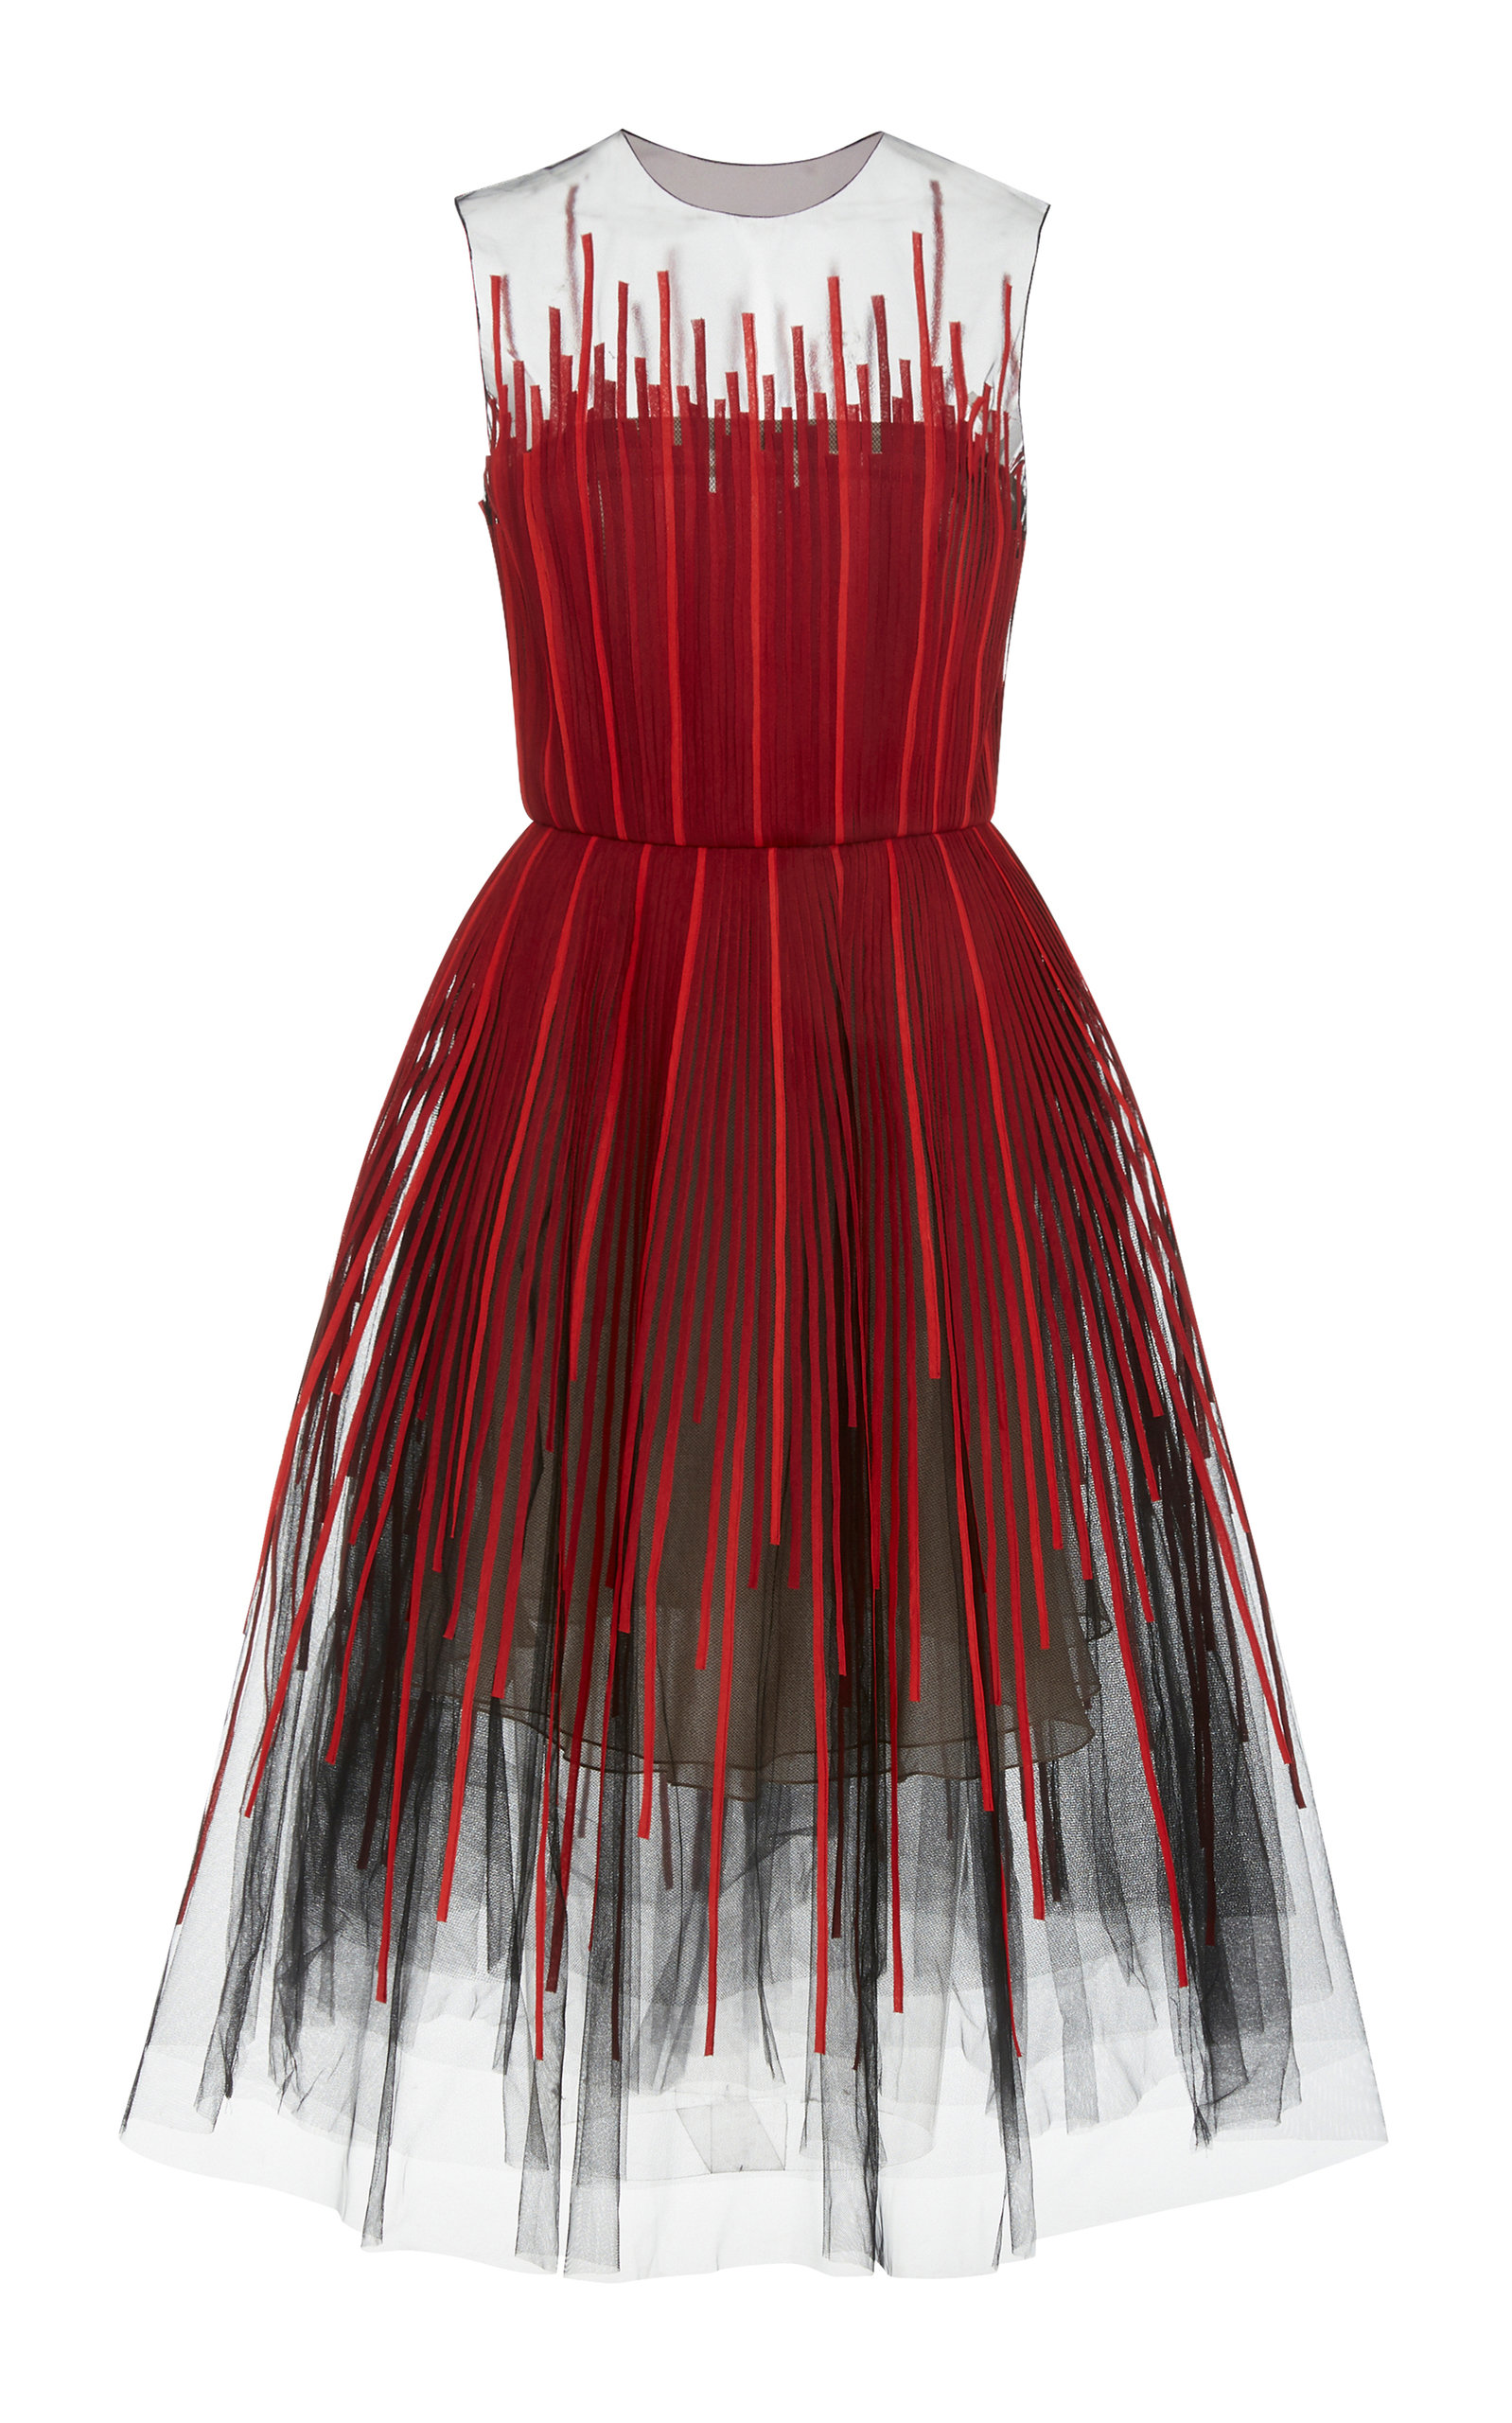 Buy Oscar de la Renta Embroidered Tulle Cocktail Dress online, shop Oscar de la Renta at the best price